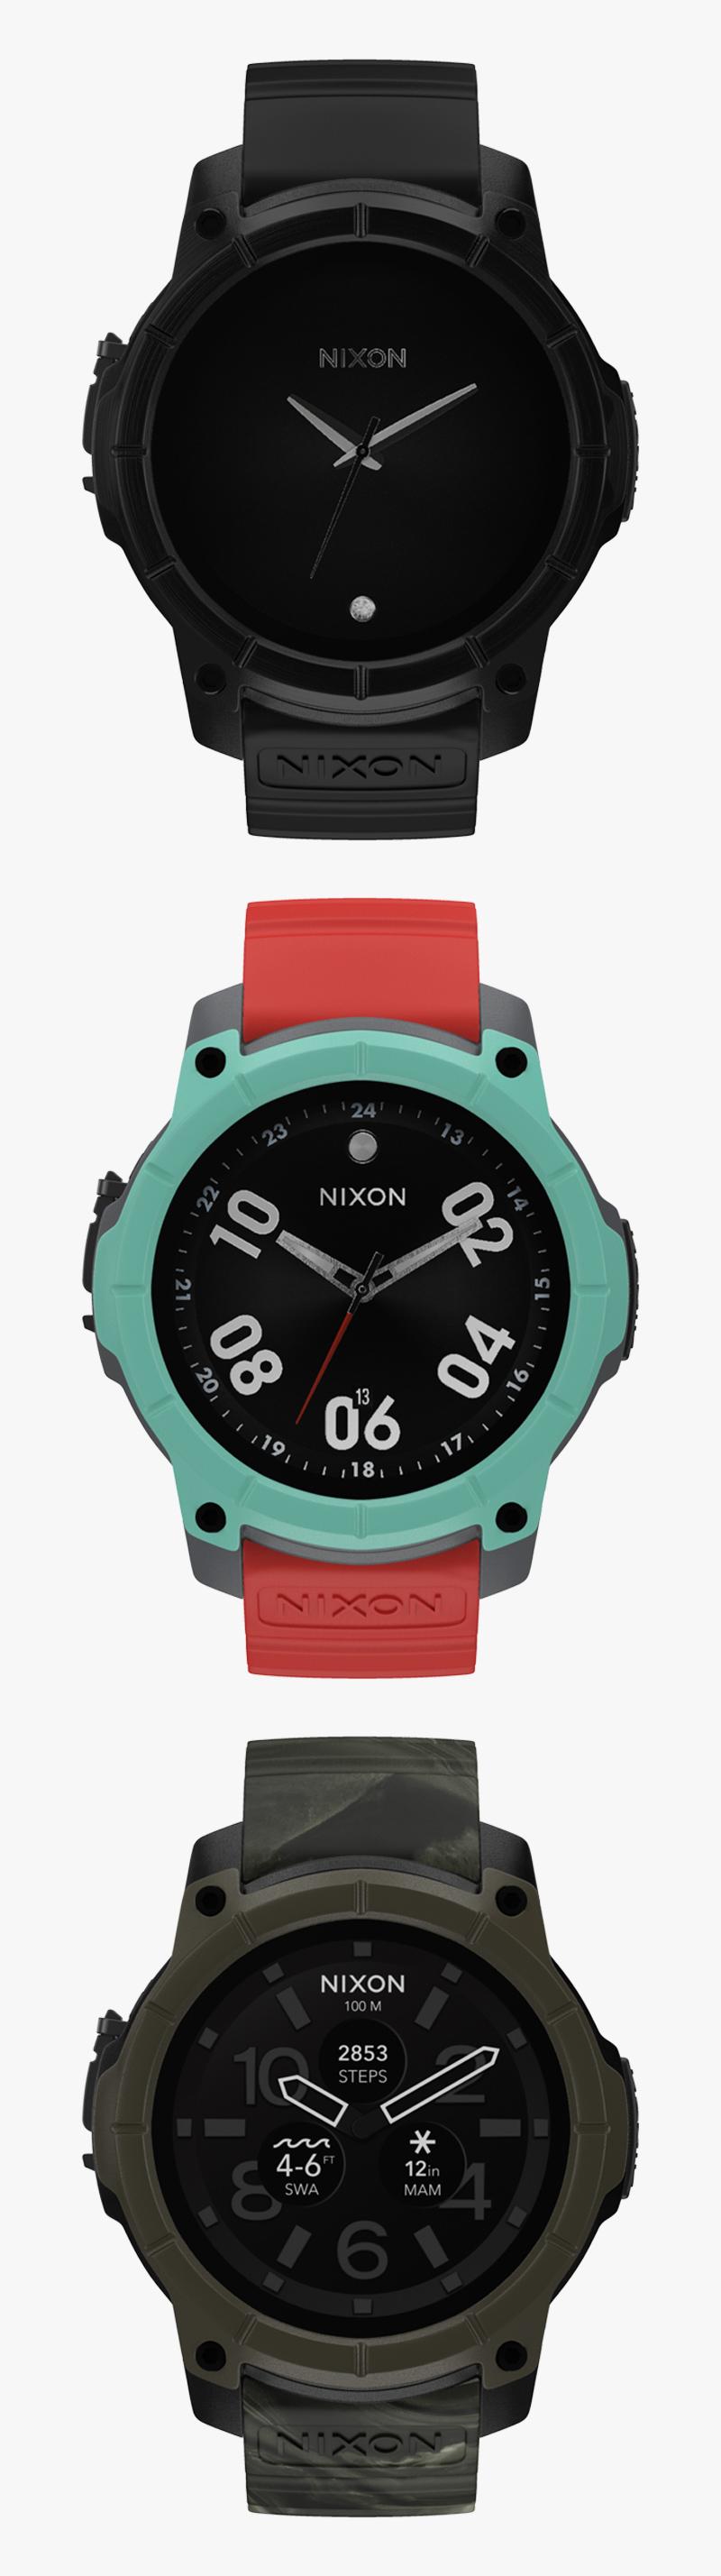 Nixon Mission Product Custom Mobile